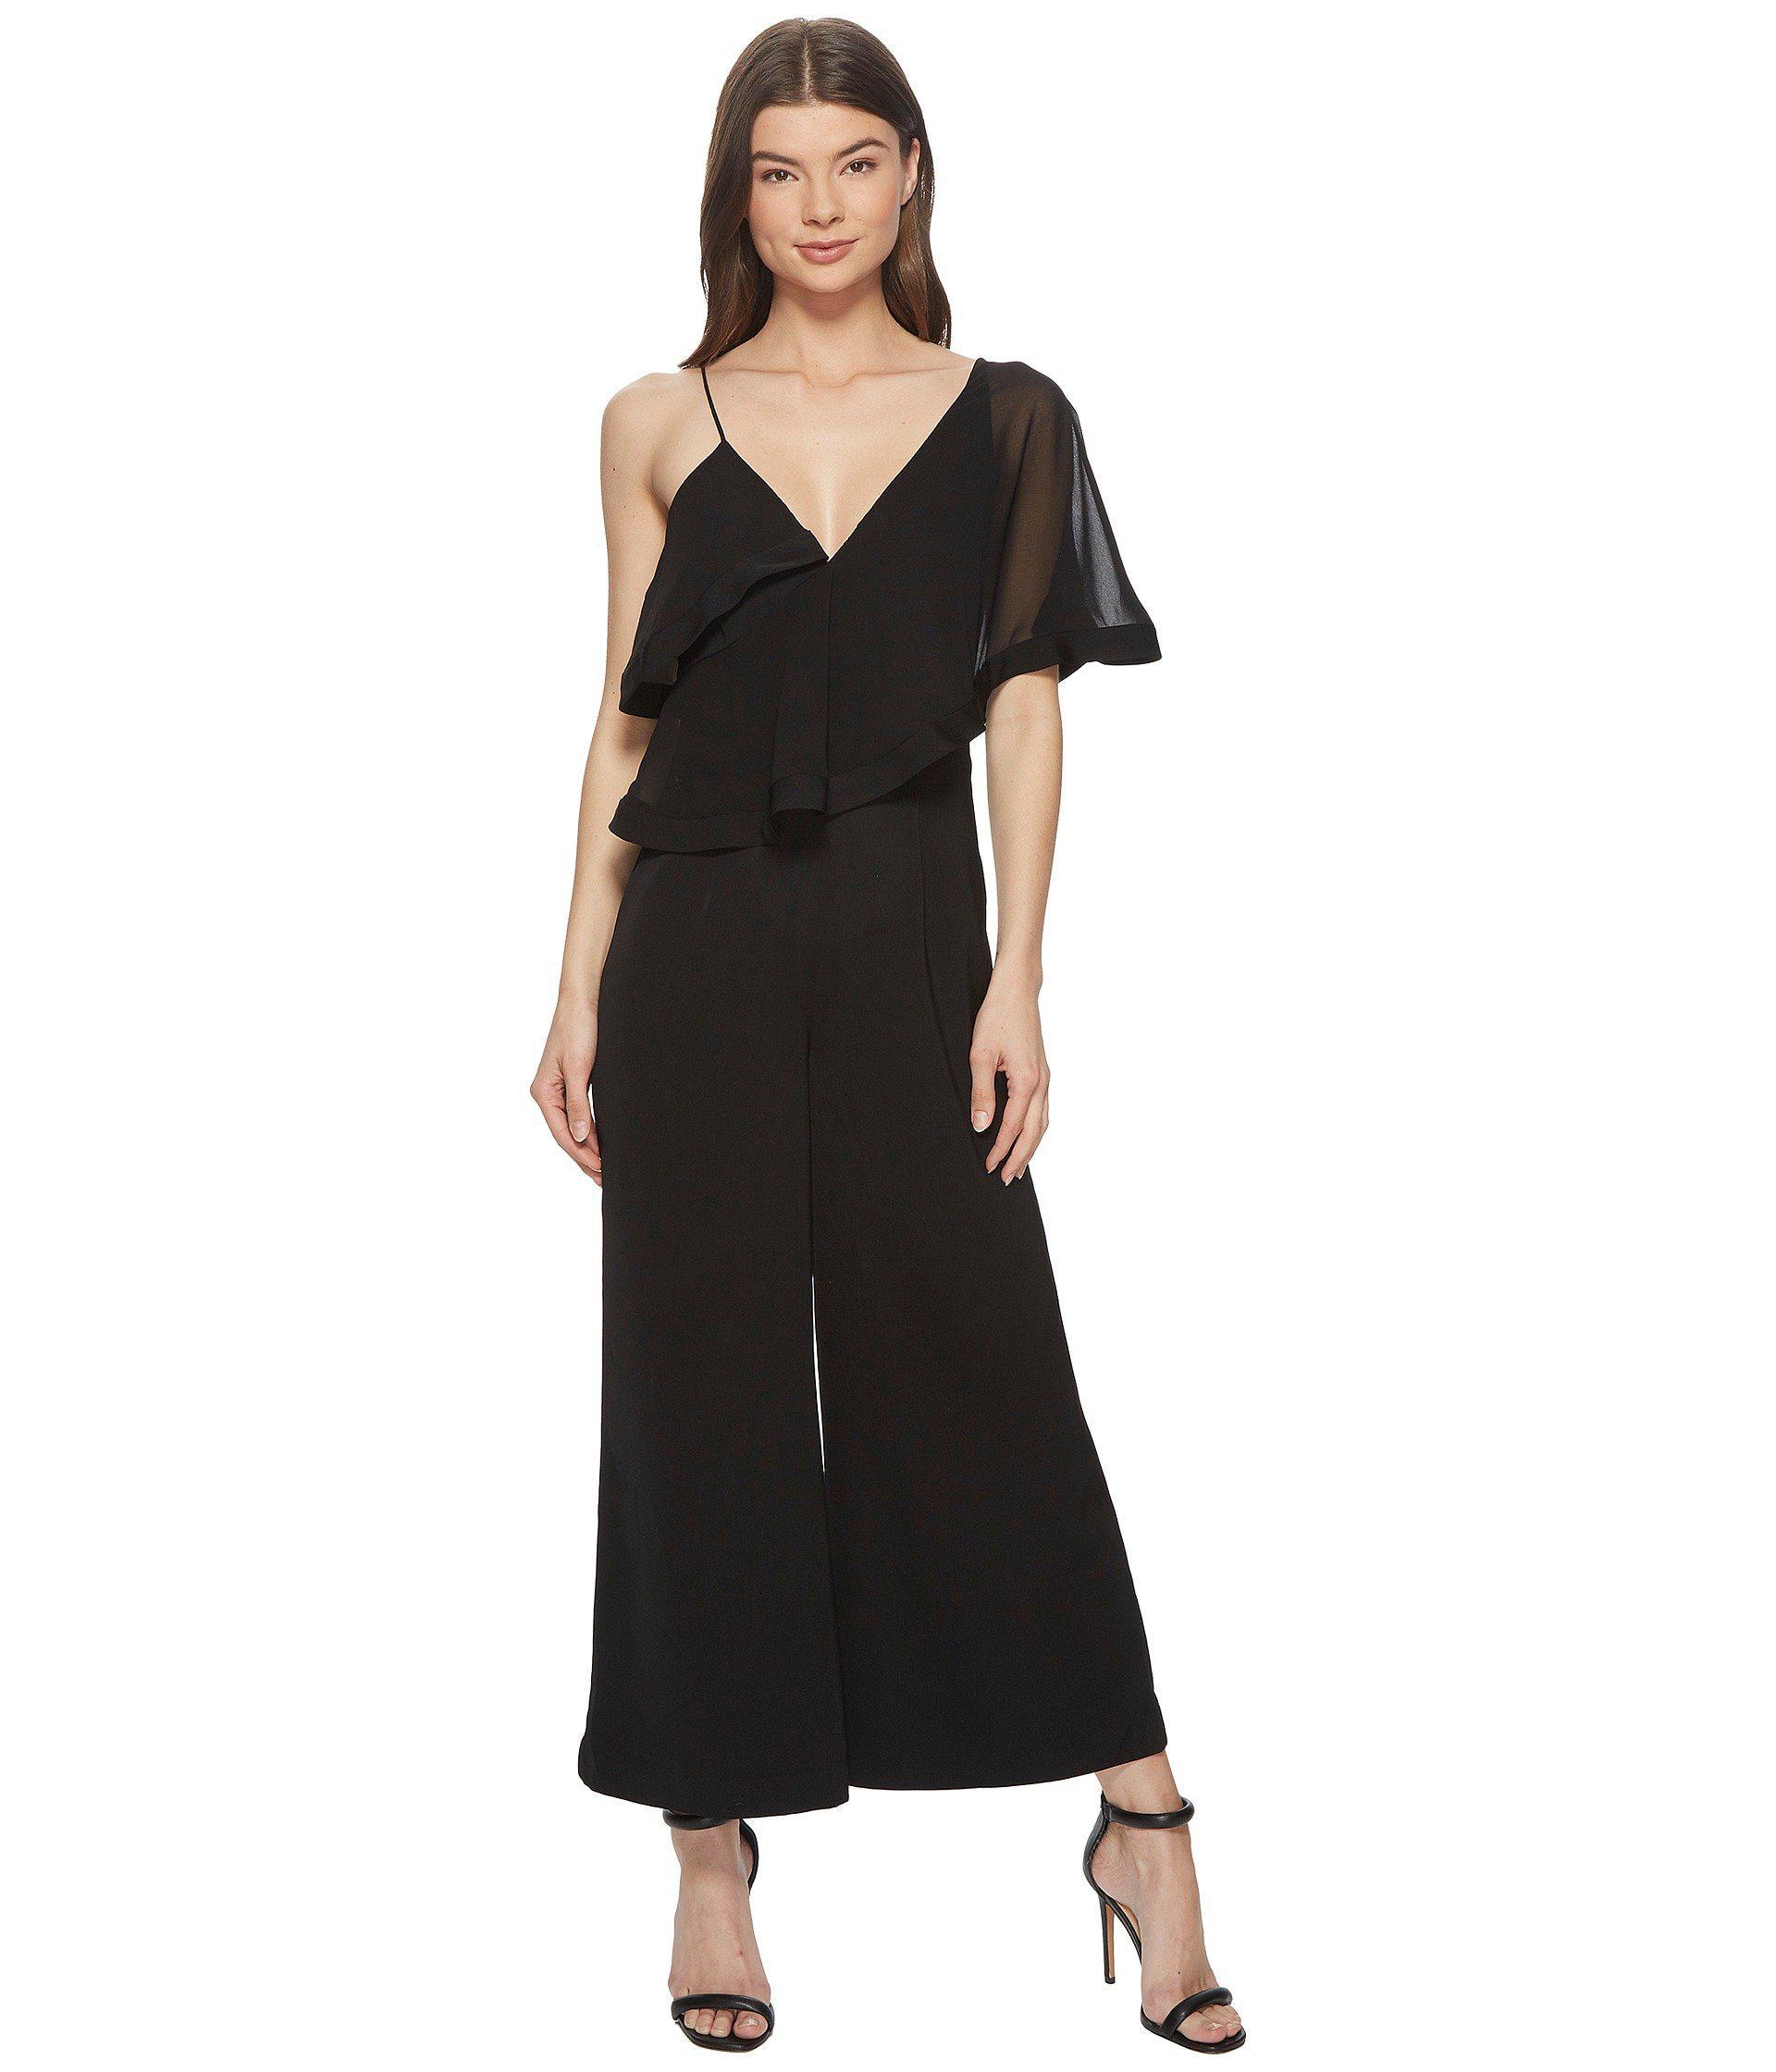 12337478f40 Lyst - Keepsake No Love Jumpsuit in Black - Save 50%